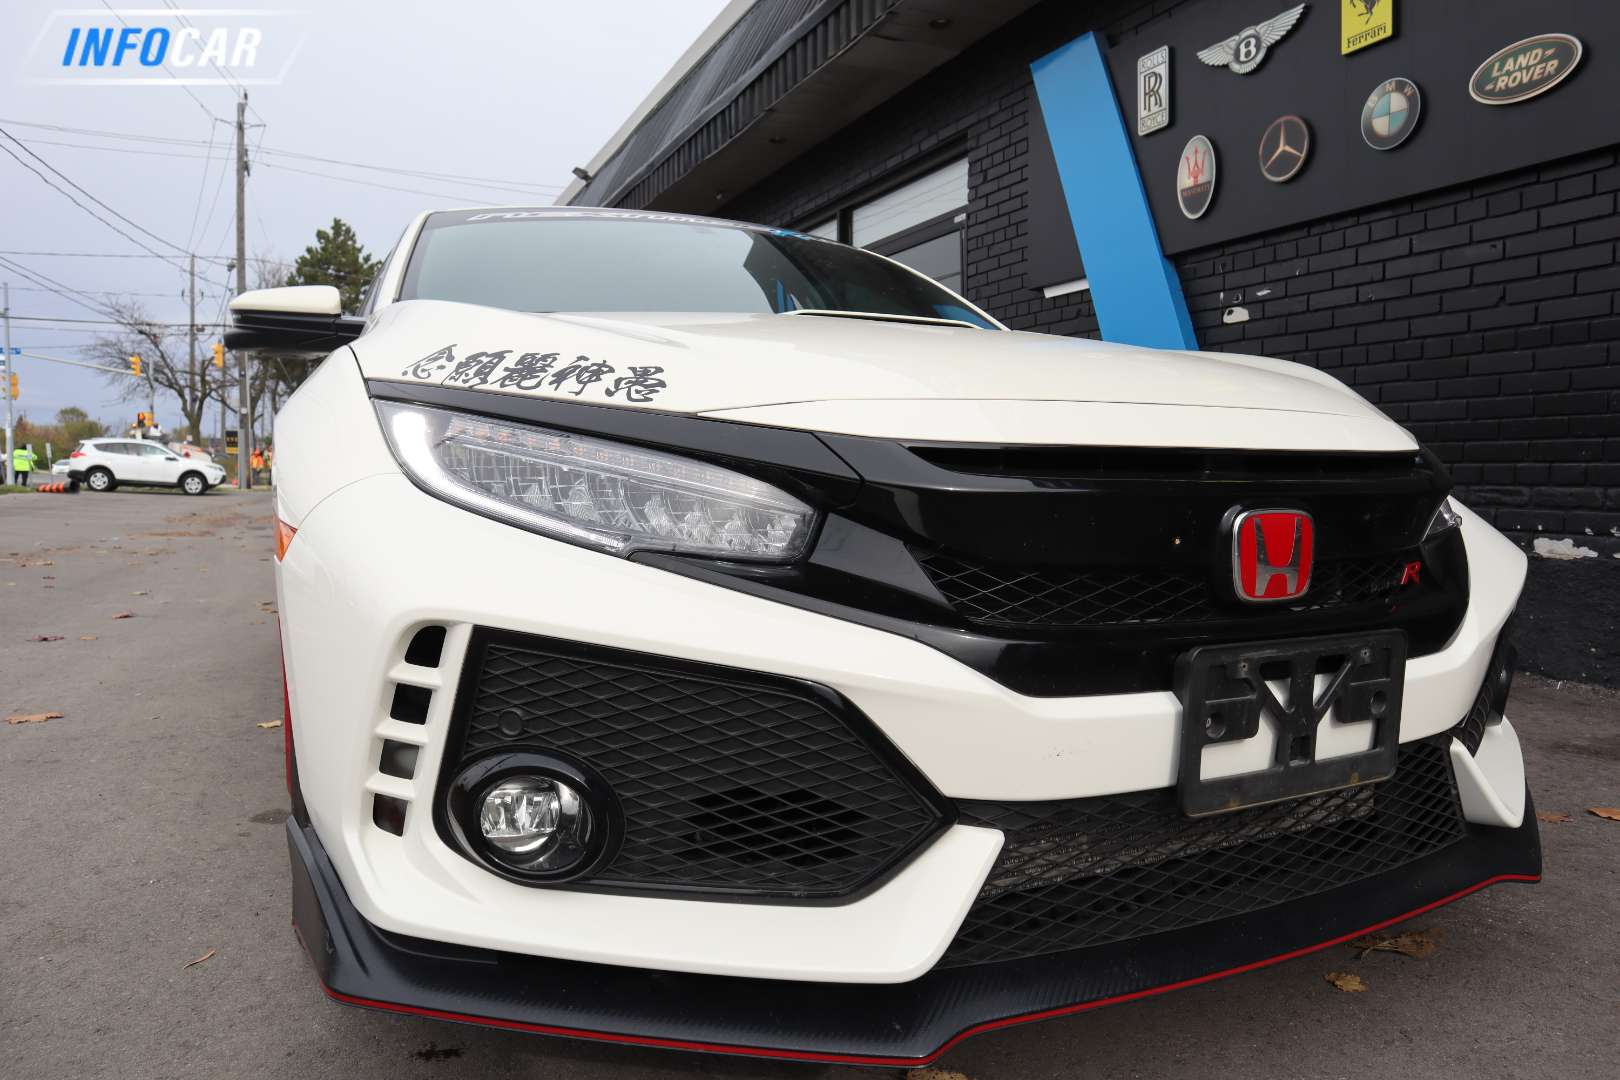 2018 Honda Civic typeR - INFOCAR - Toronto's Most Comprehensive New and Used Auto Trading Platform